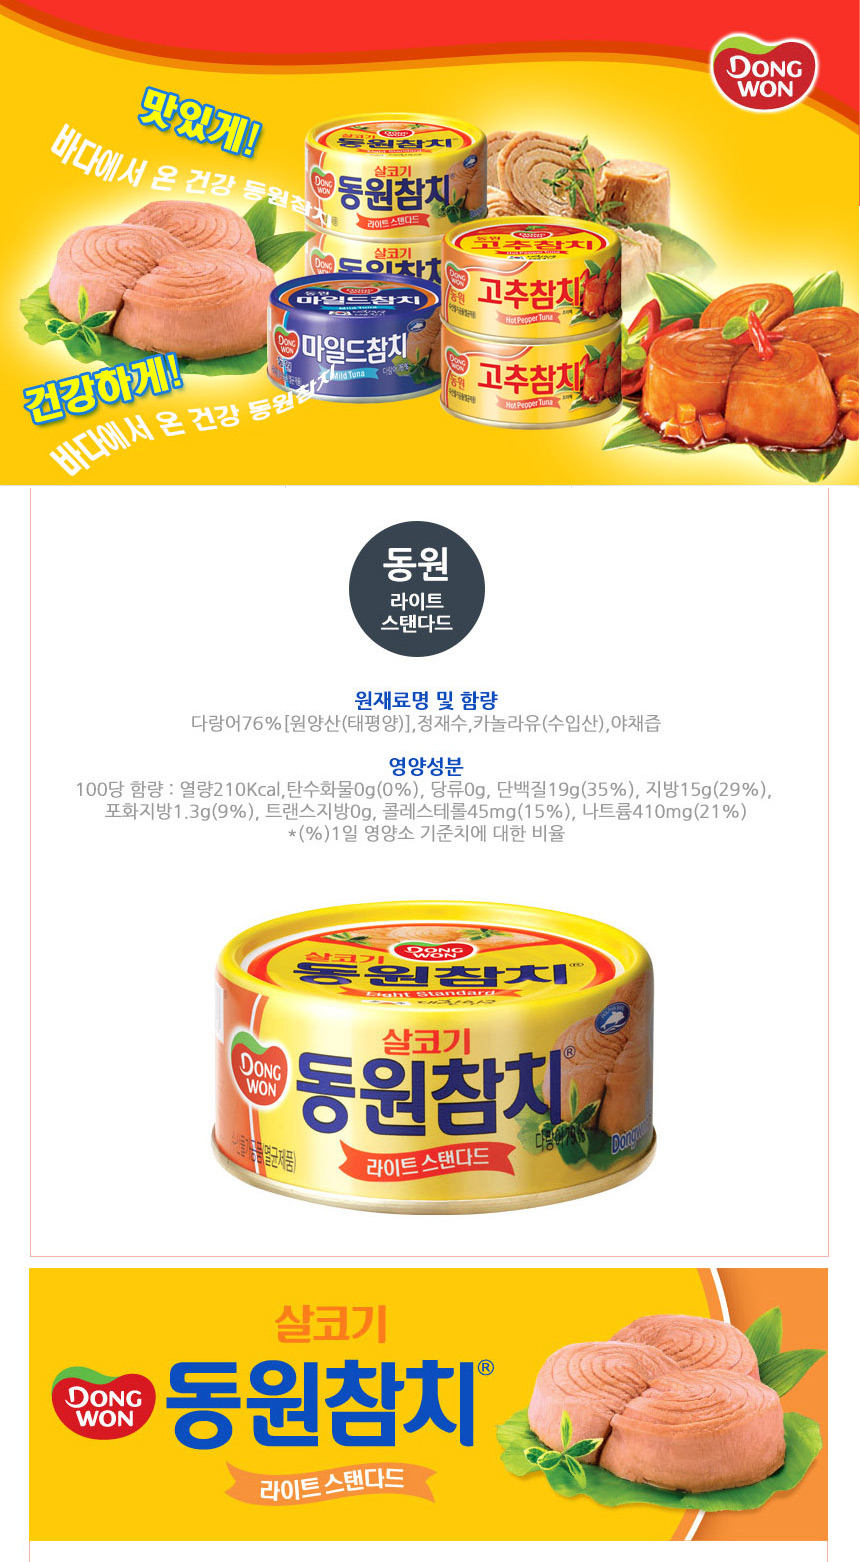 [ Dongwon ] Dongwon(东远) 东远原味金枪鱼罐头150gx2pcs+东远淡味金枪鱼罐150gx2pcs东远辣椒金枪鱼罐150gx2pcs